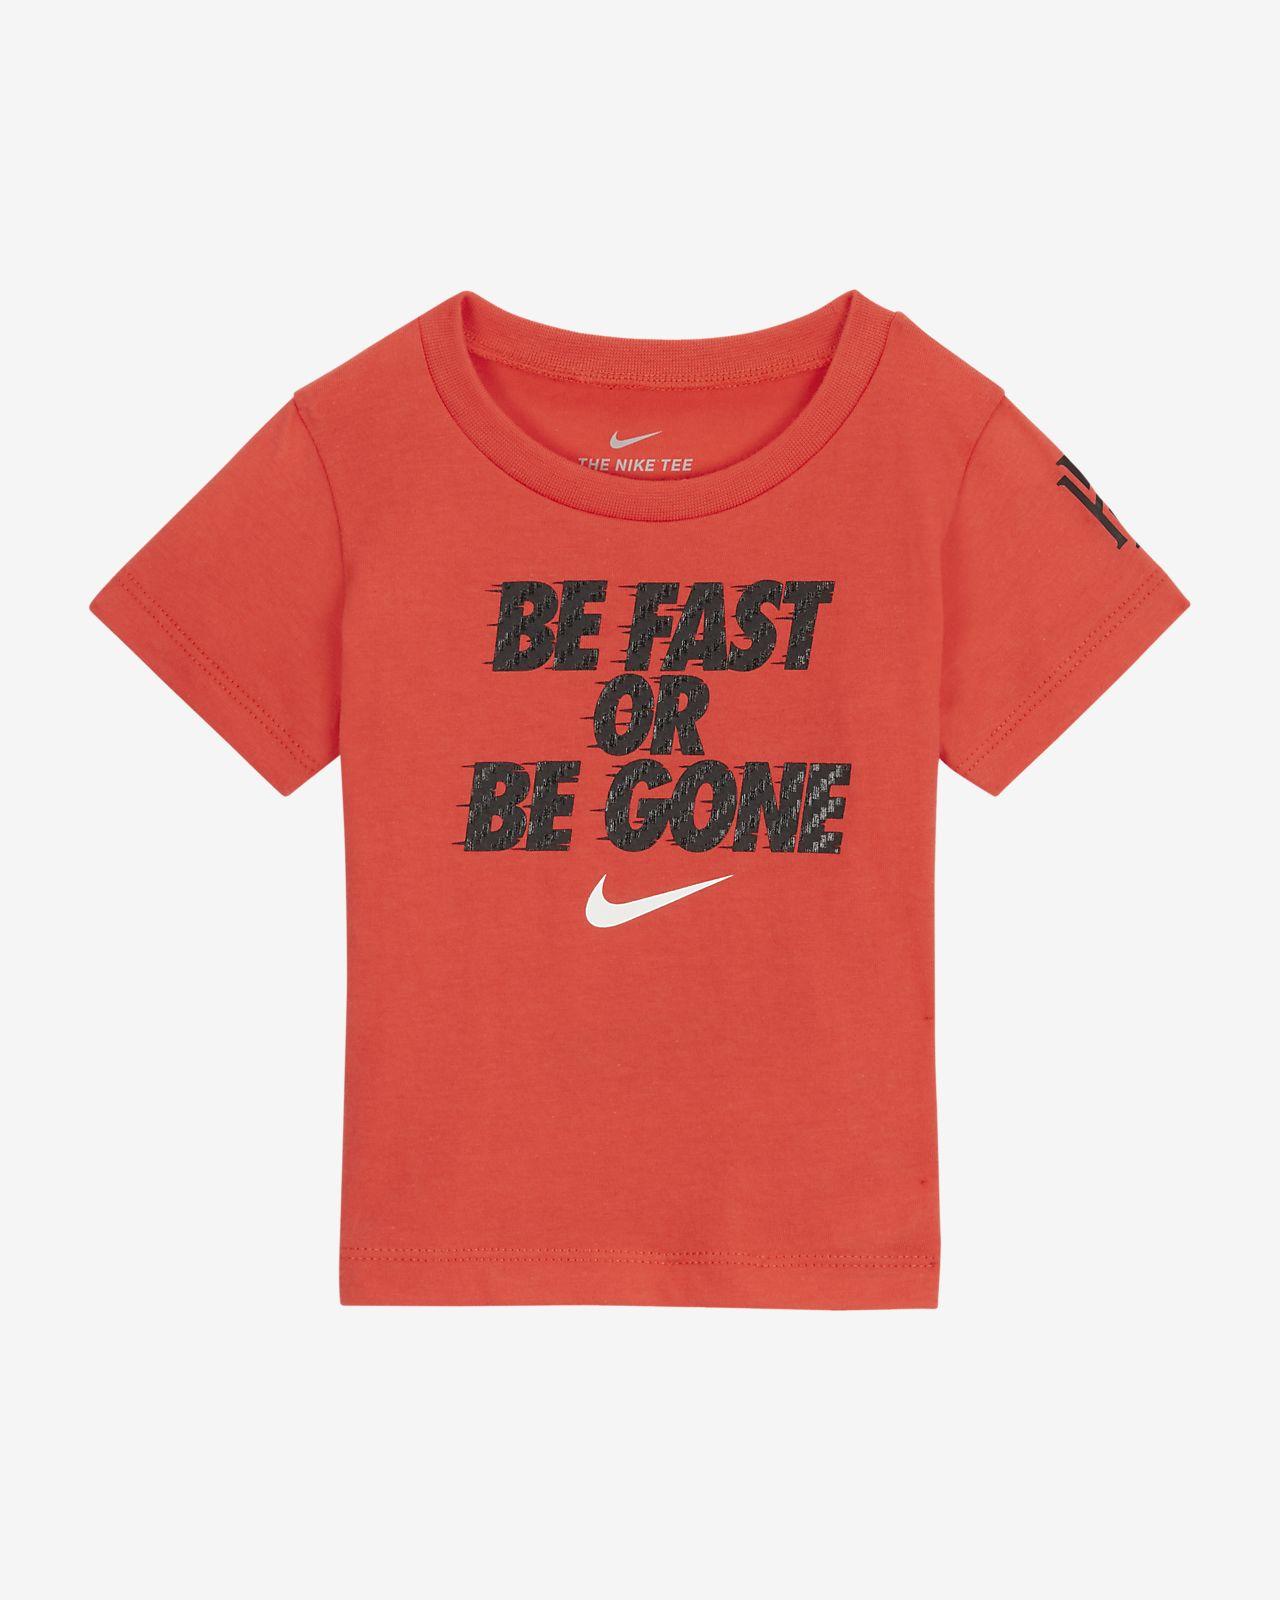 Nike Baby (12–24M) Short-Sleeve T-Shirt